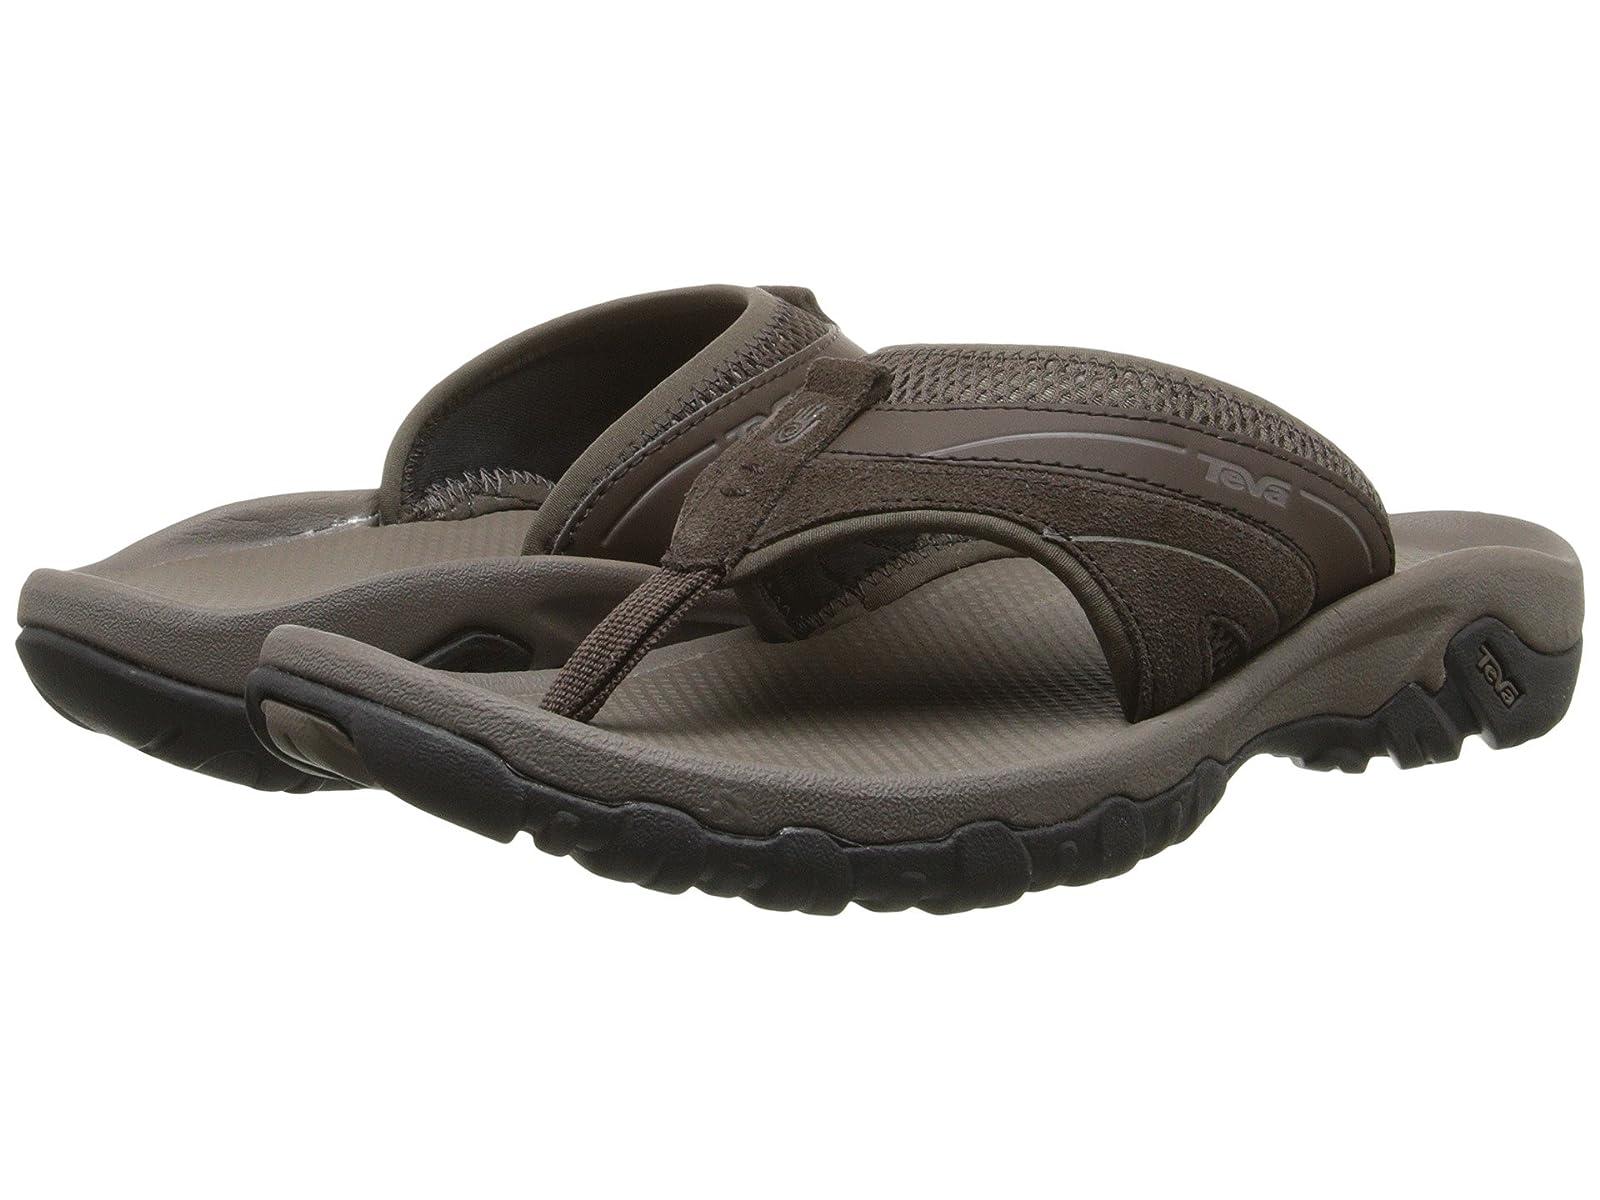 Teva PajaroAtmospheric grades have affordable shoes